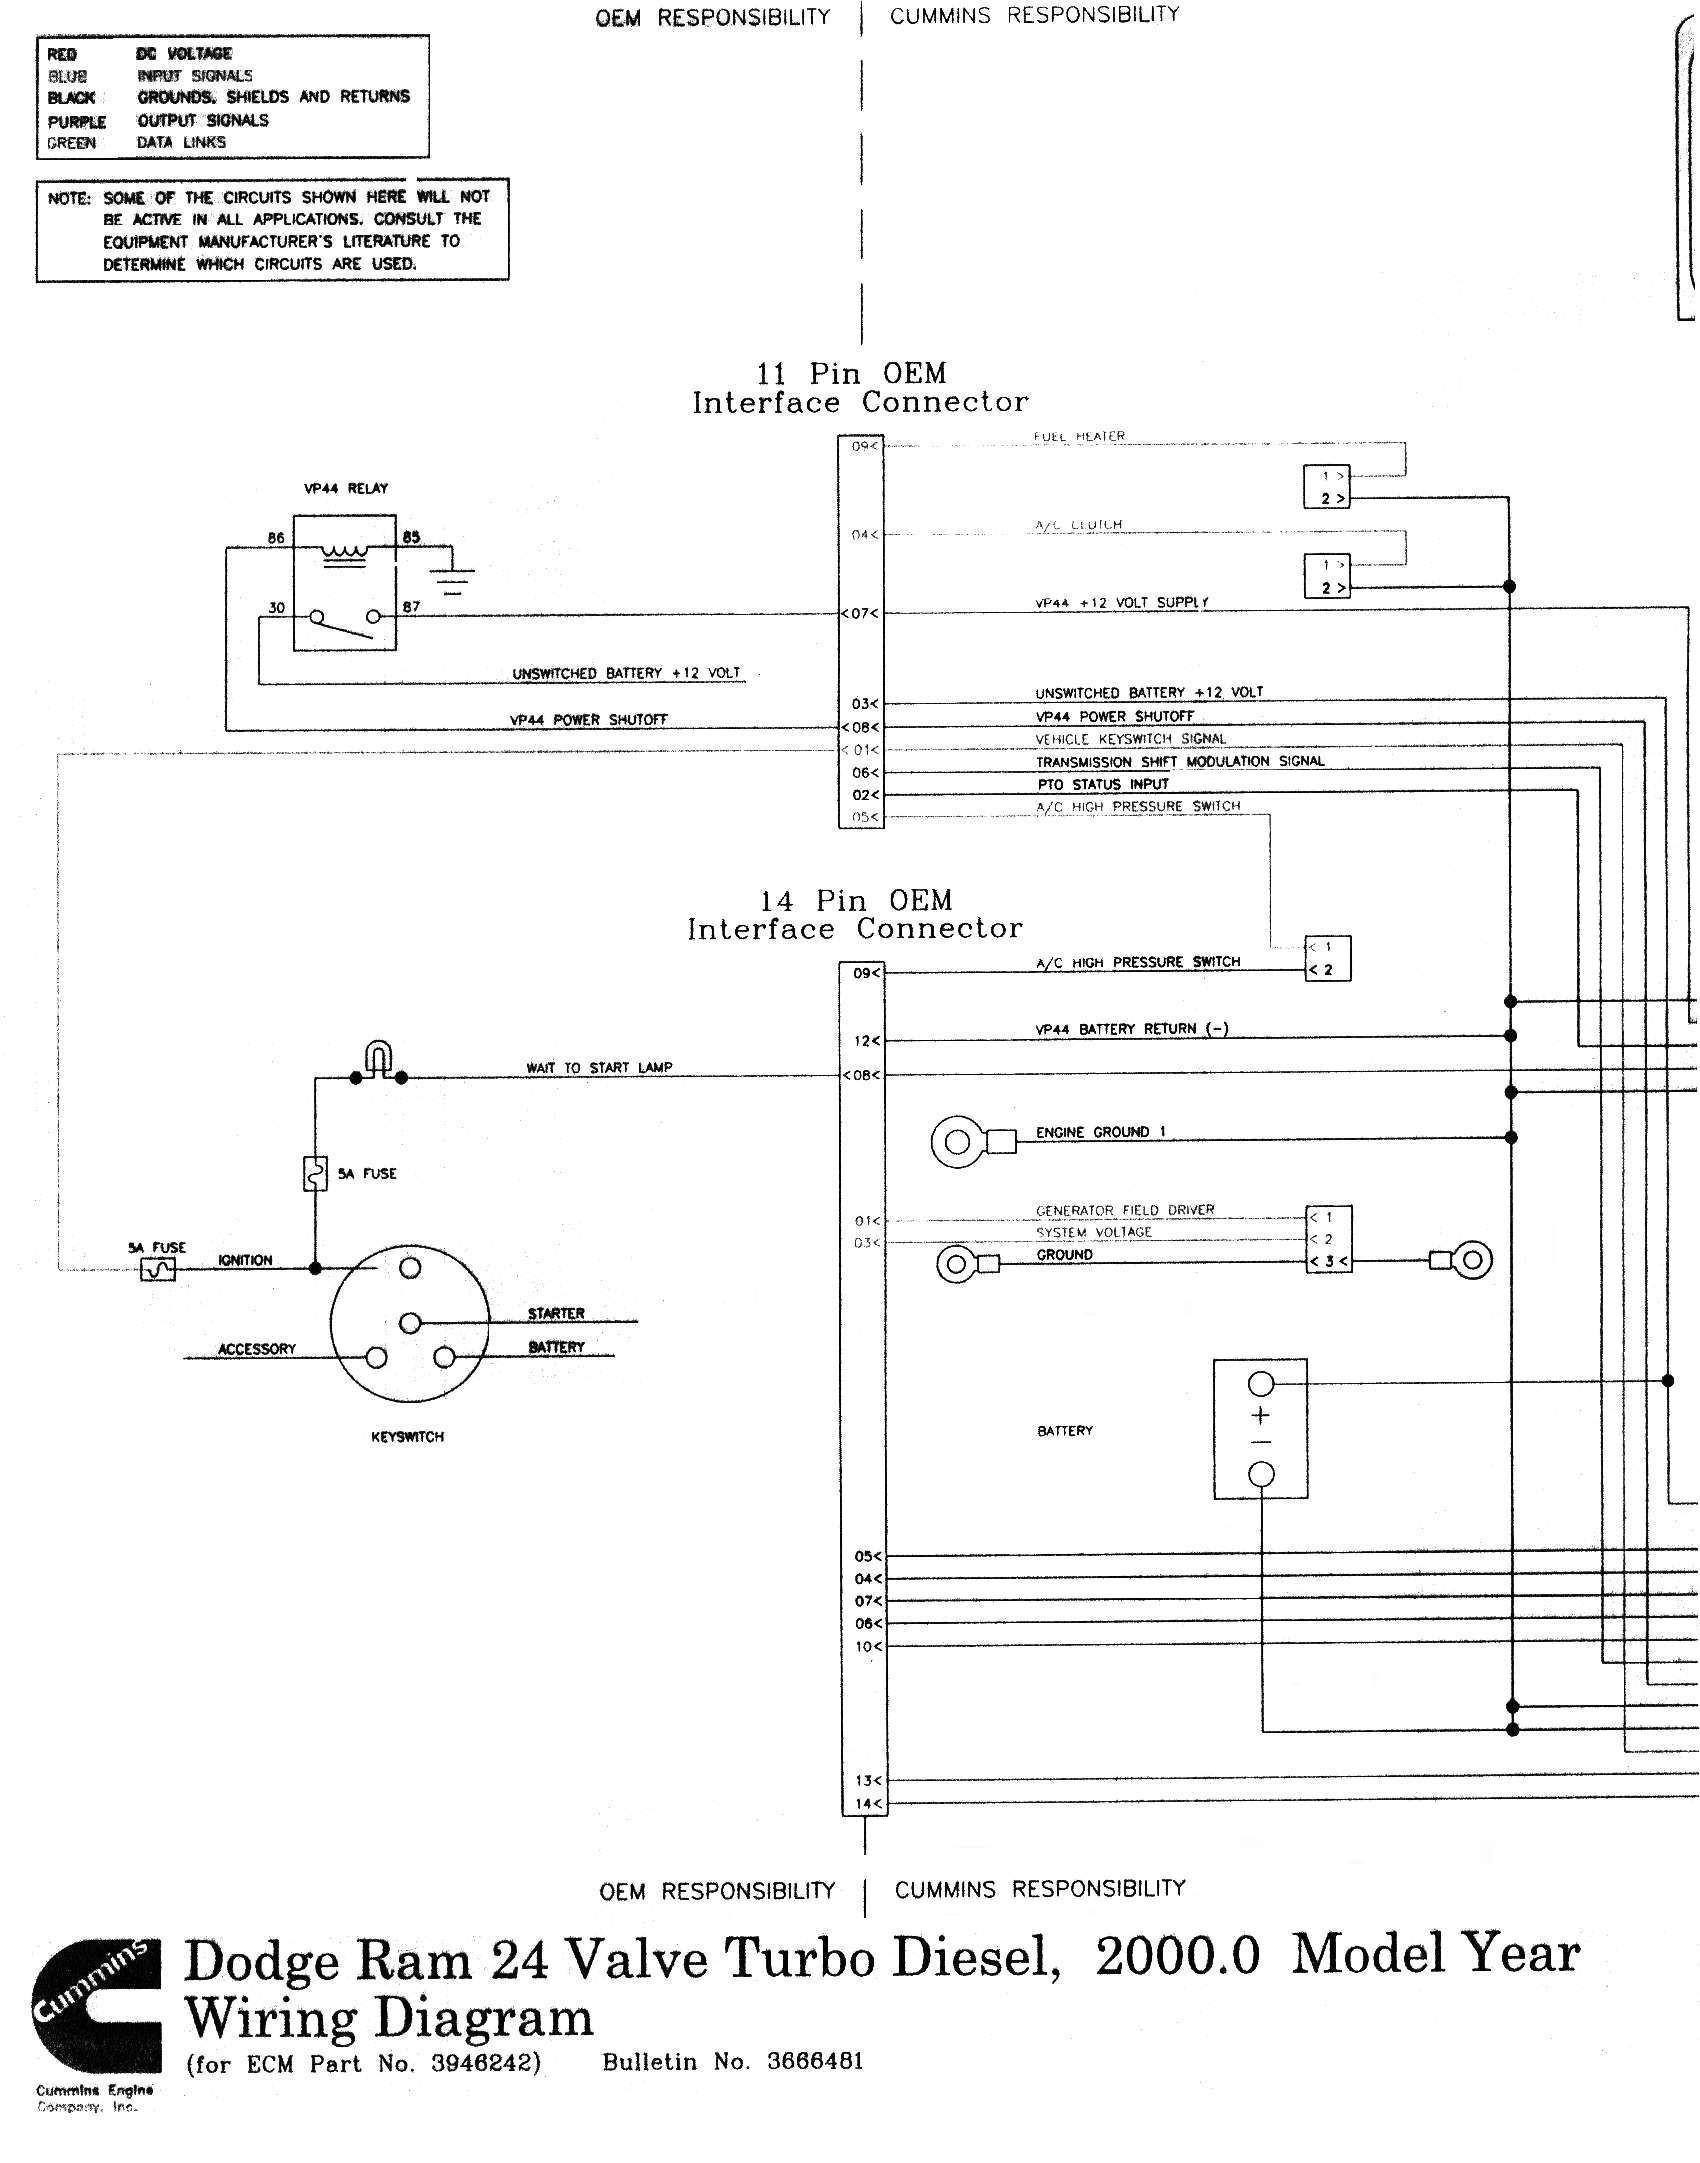 hight resolution of 5 9 cummins engine diagram 2 2005 dodge cummins ecm wiring diagram sample of 5 9